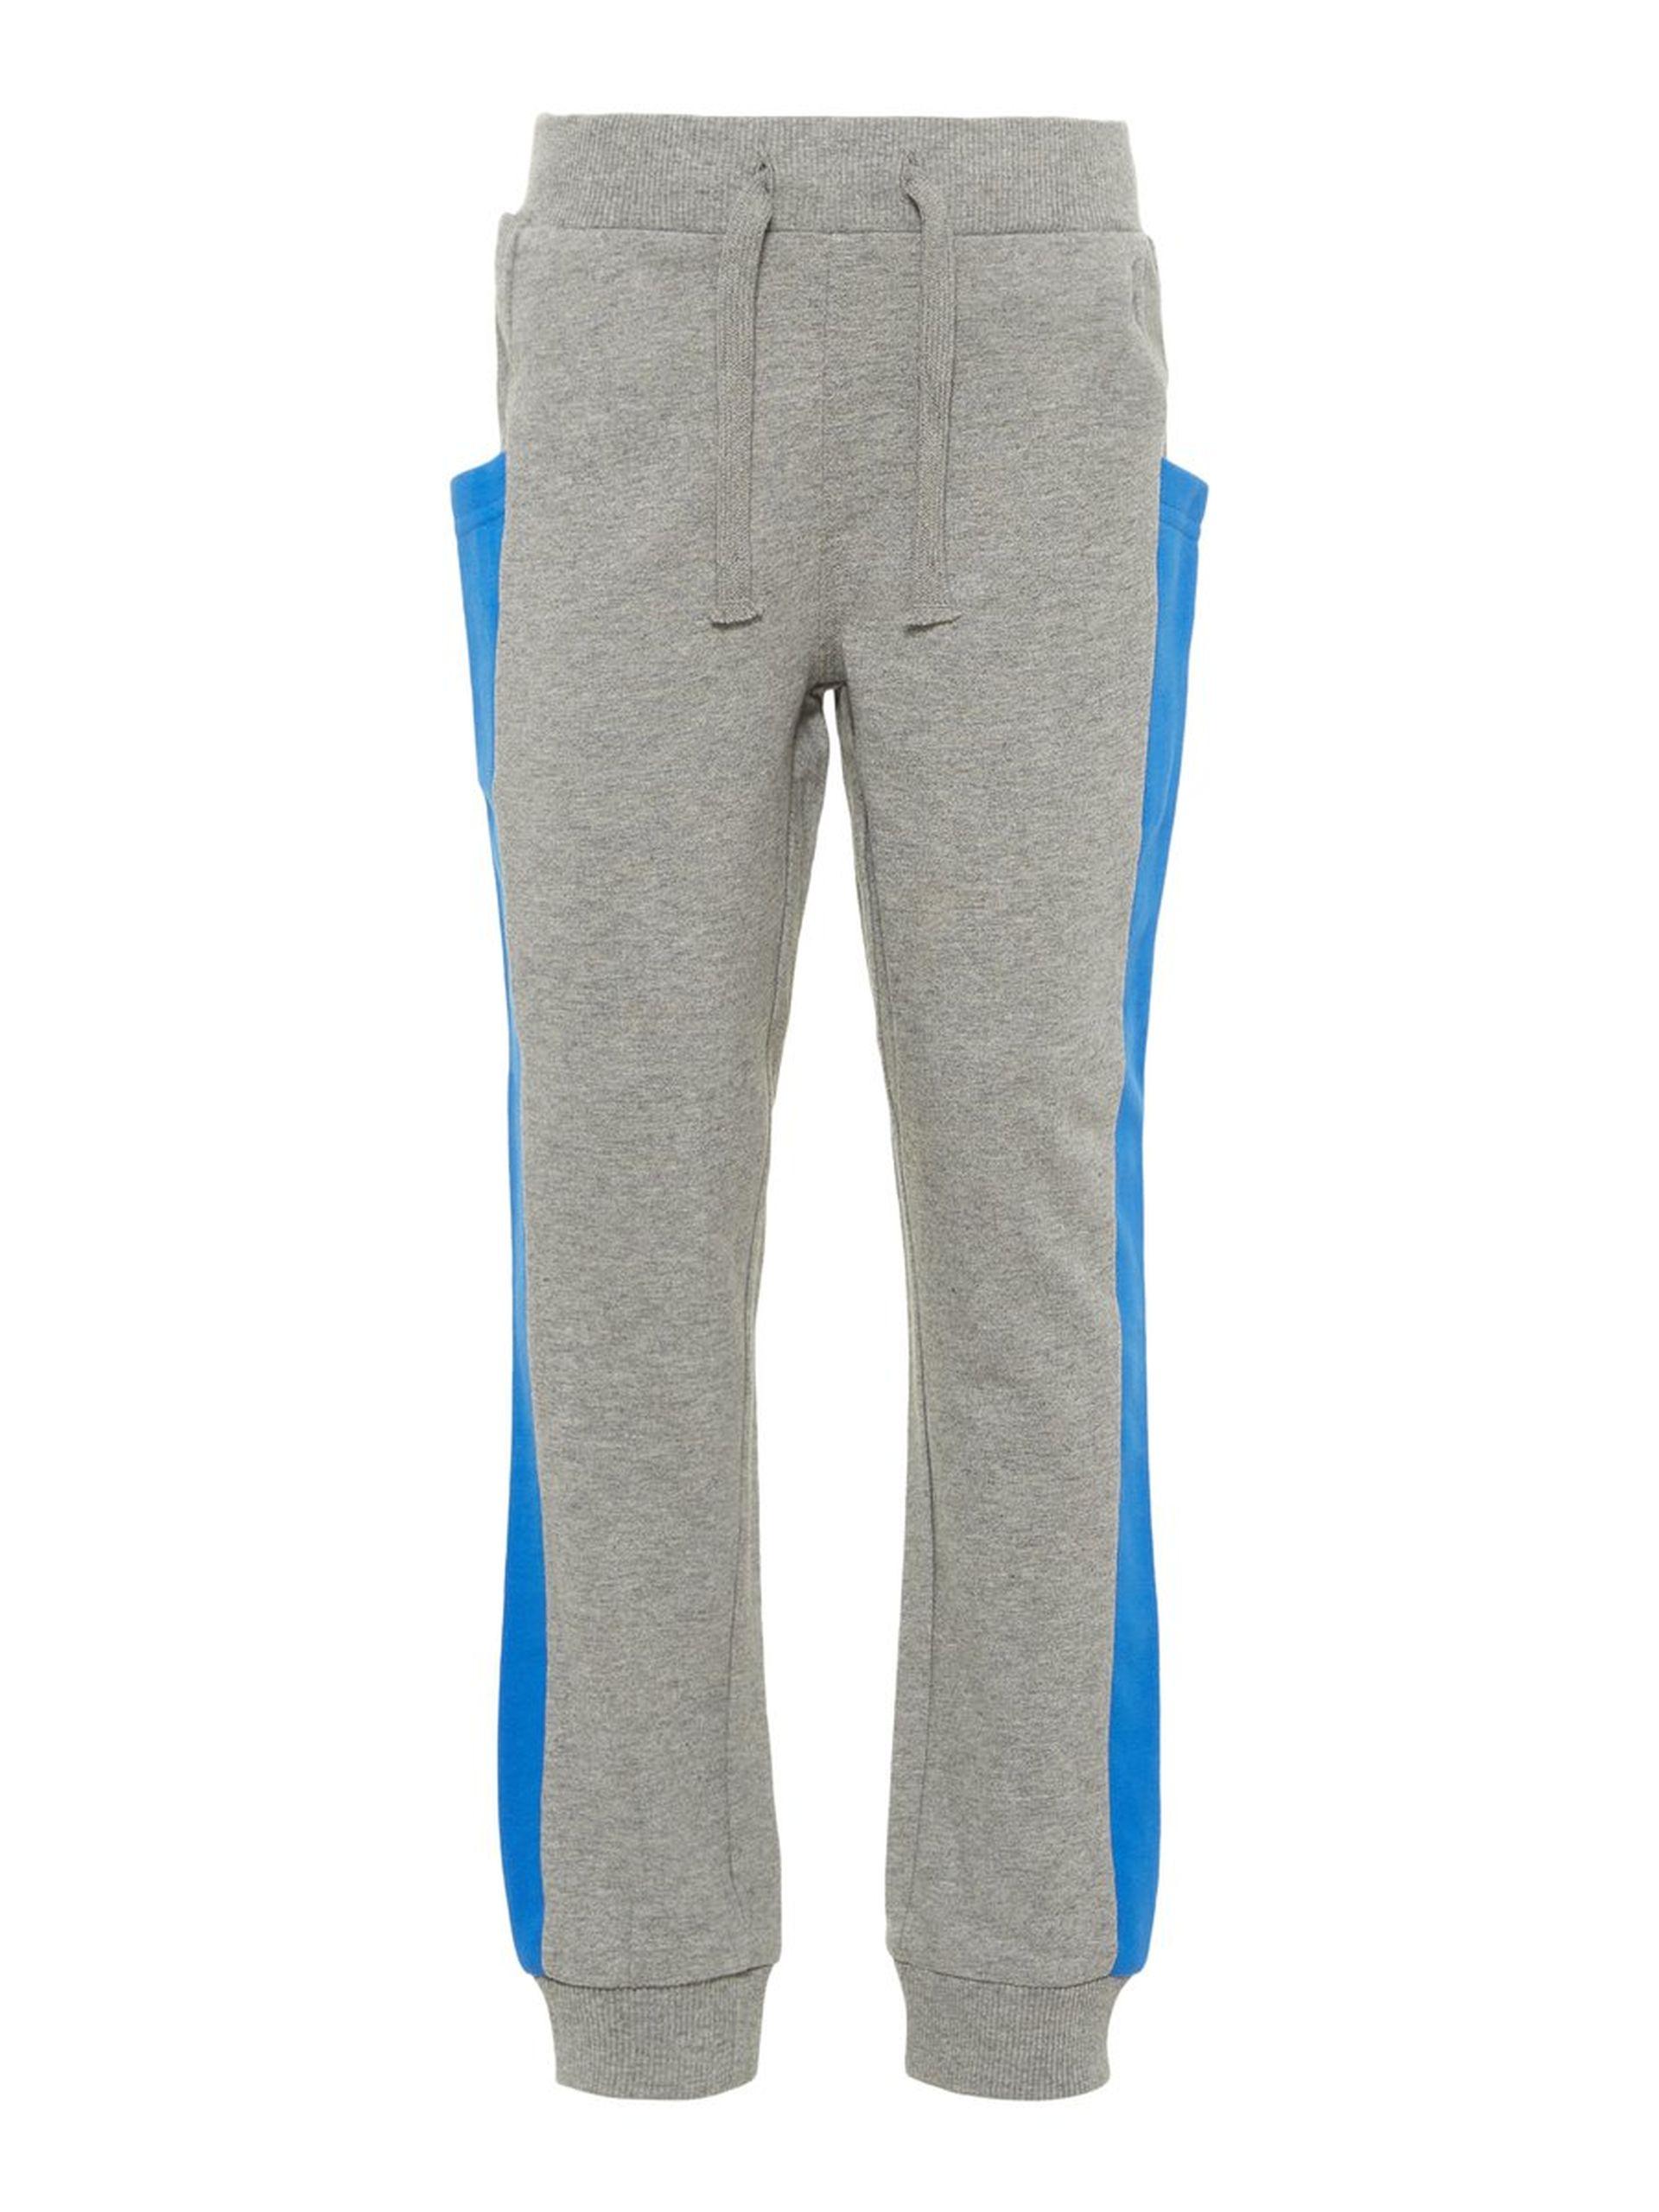 53f3c2cb8 joggebukse med blå stripe